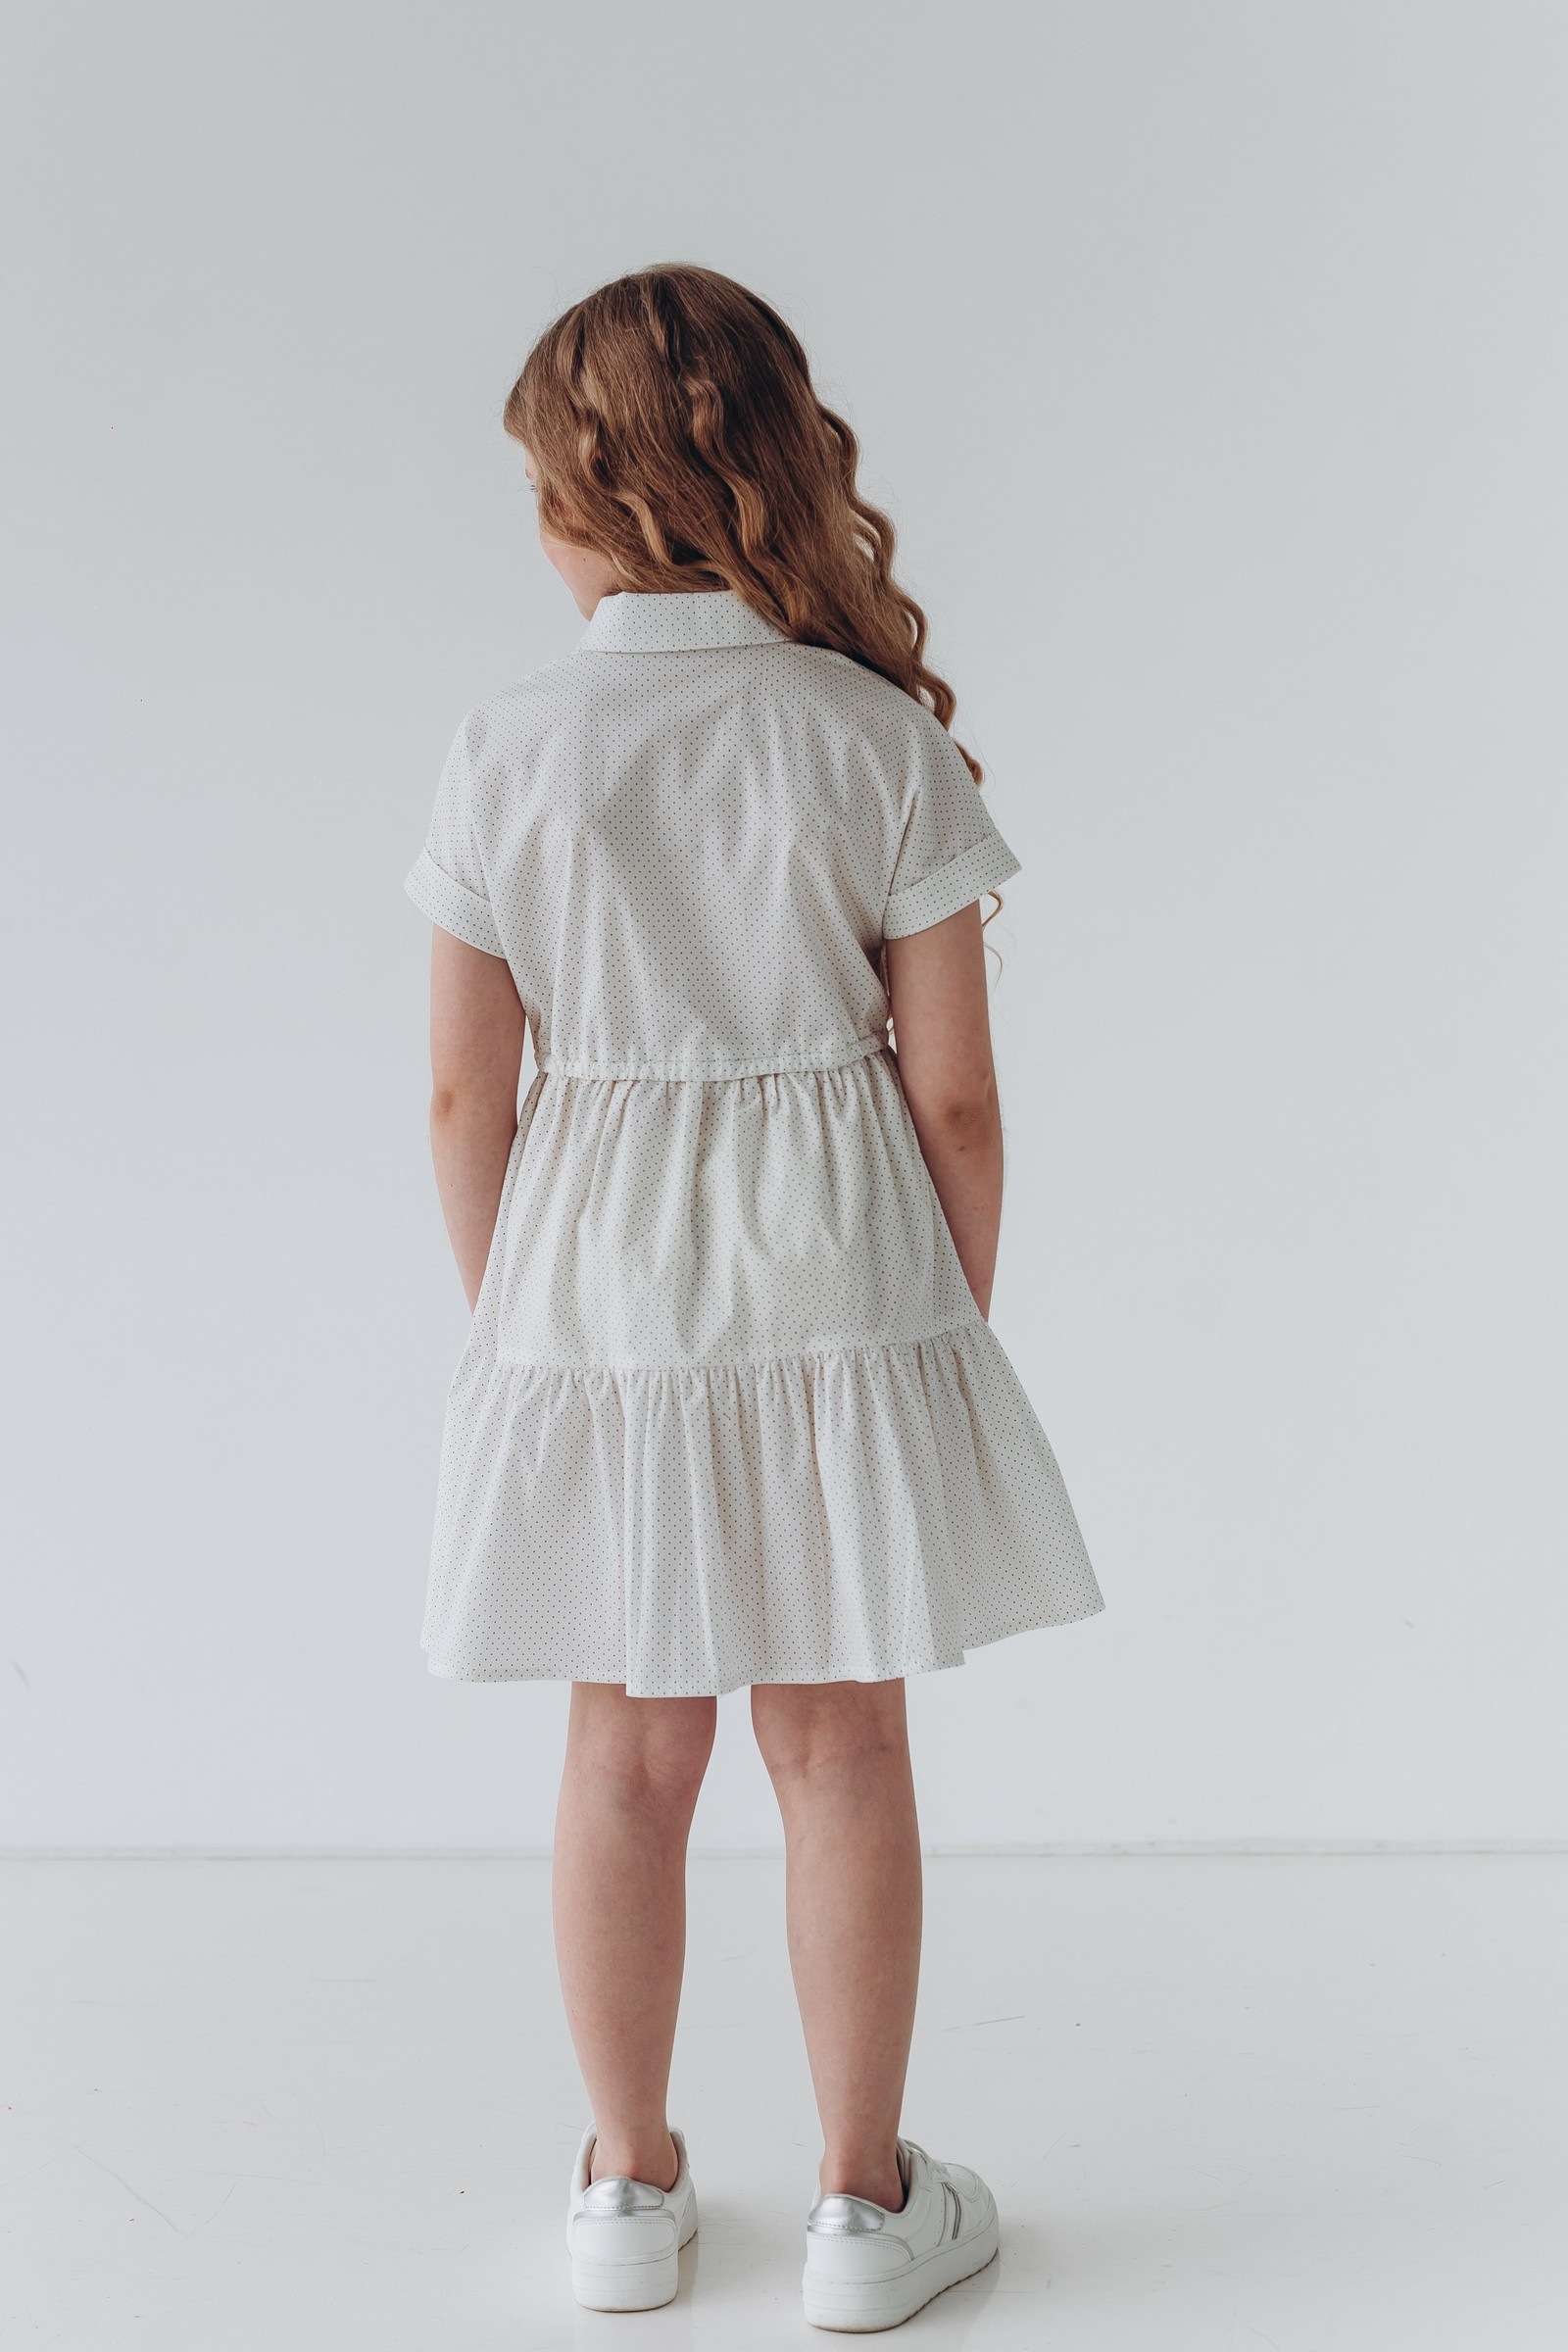 Плаття Ніколеса, фото №3